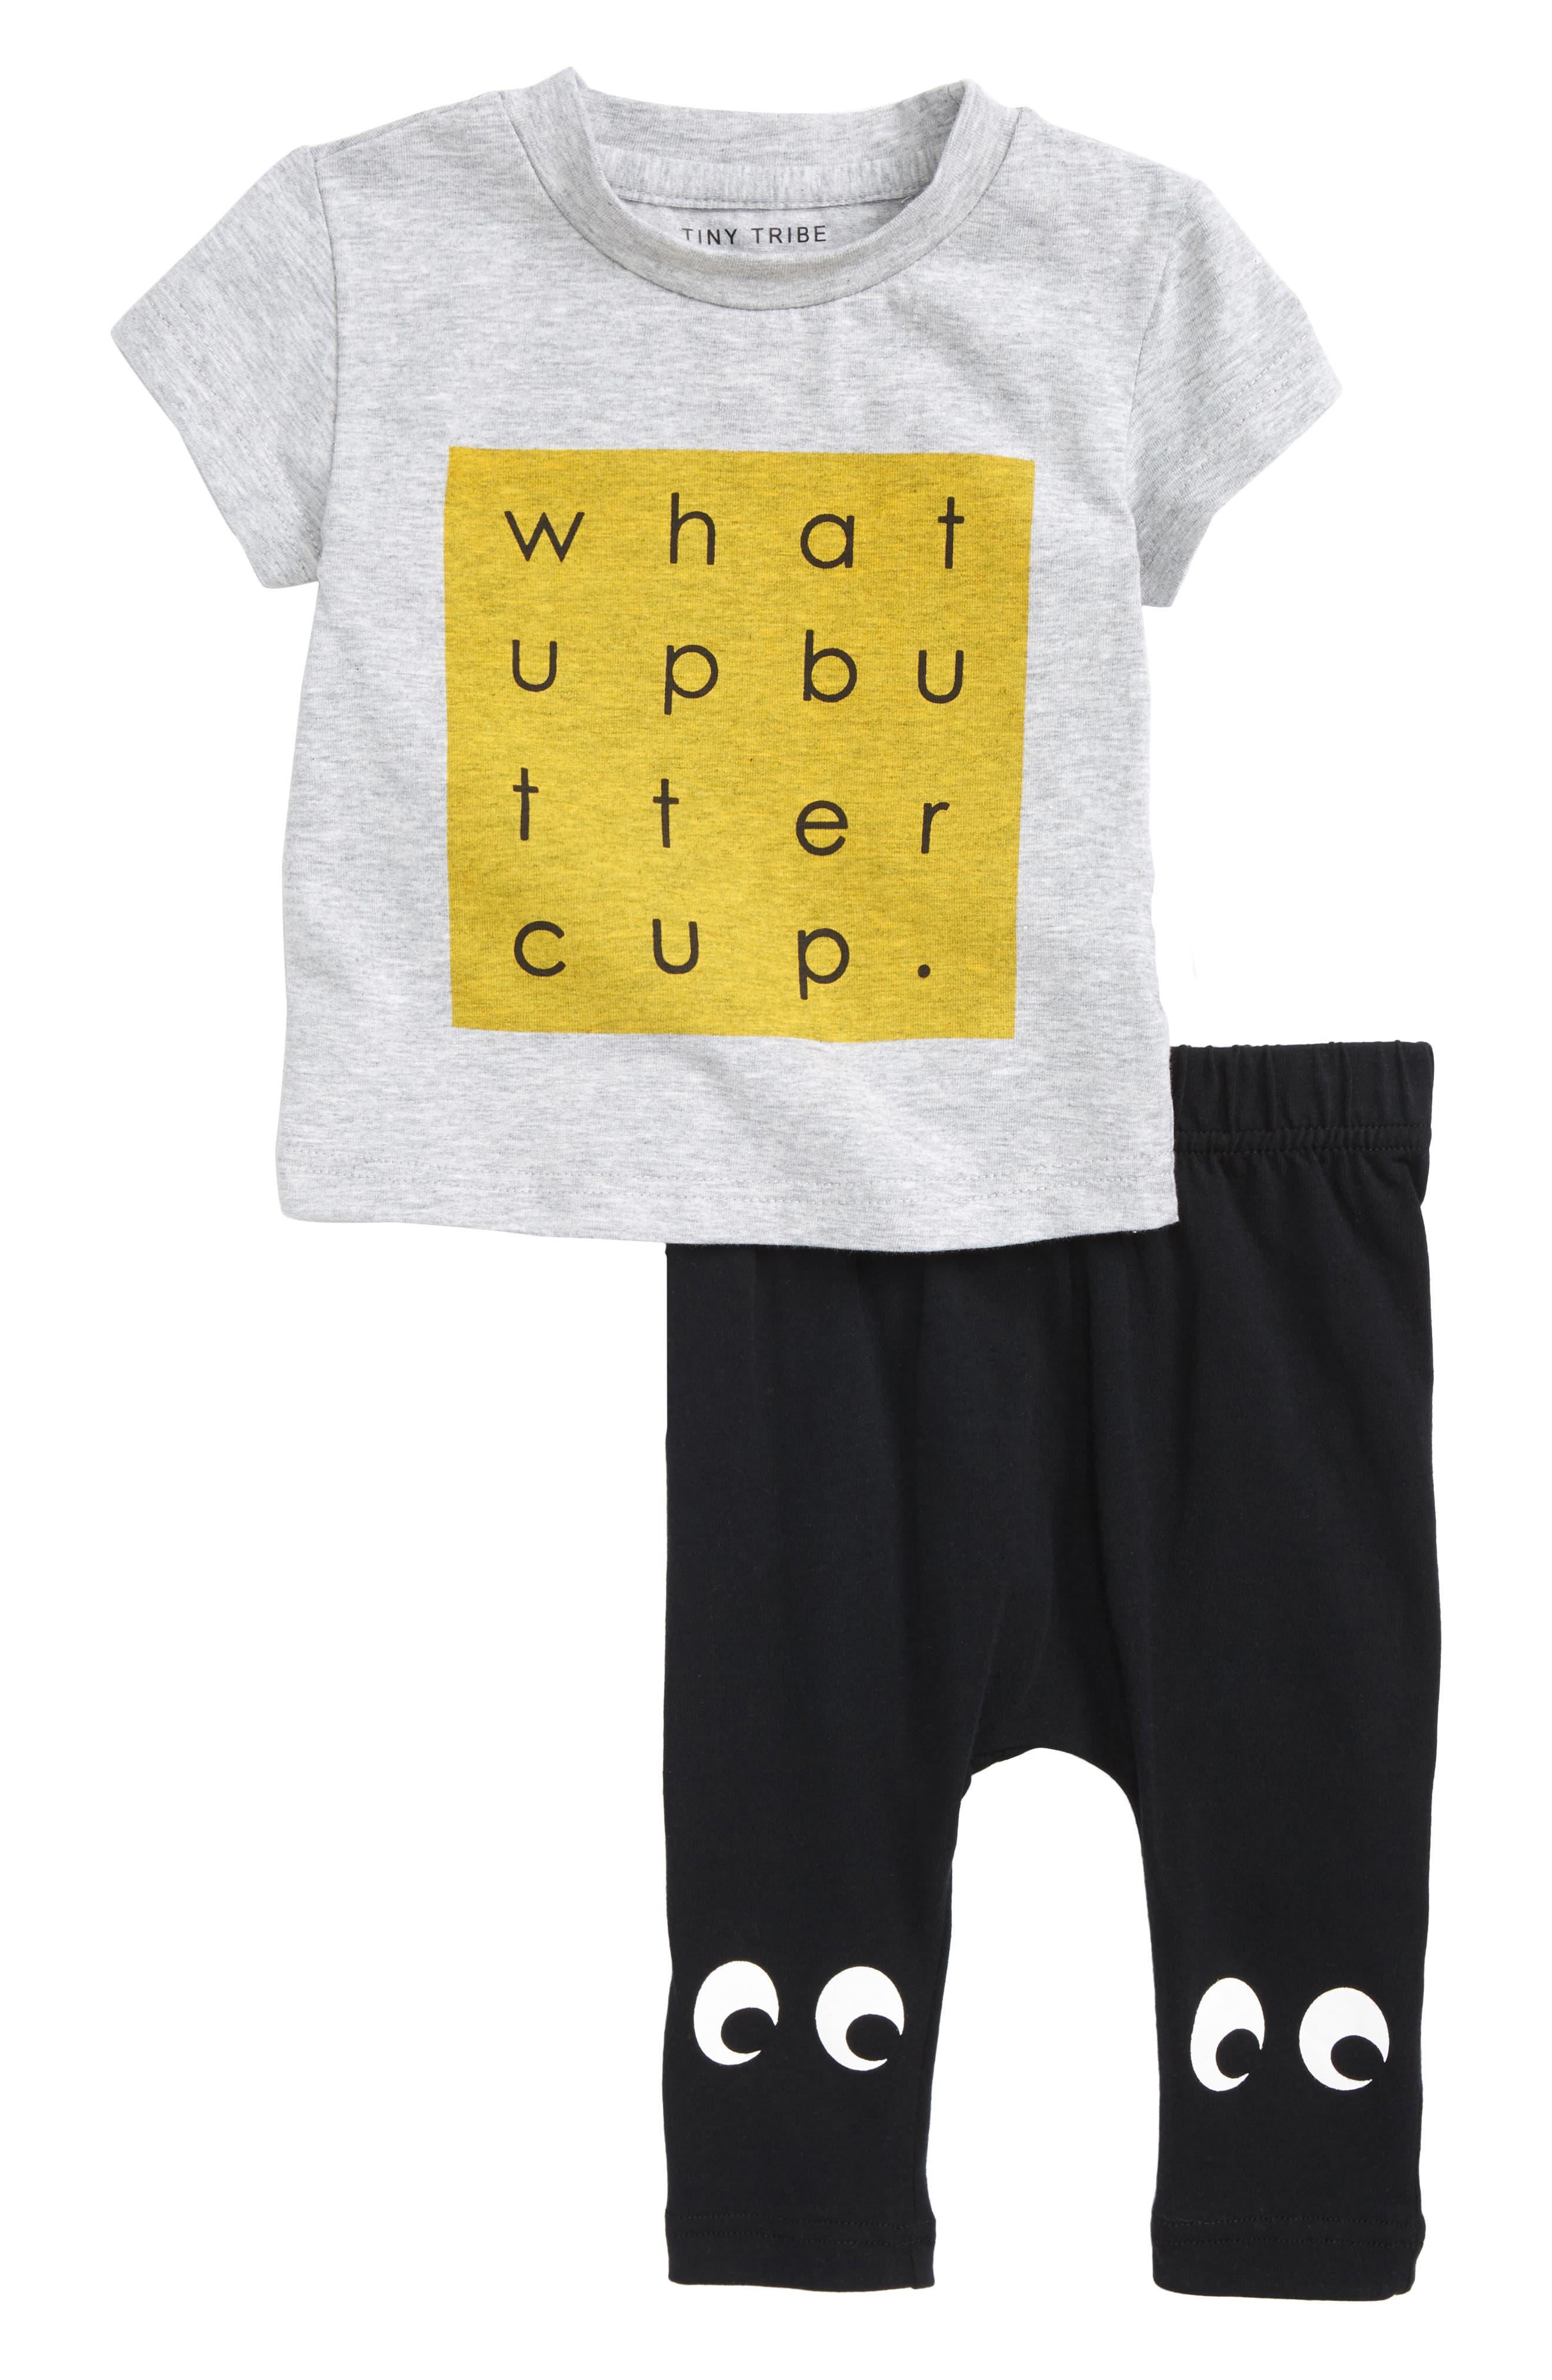 Main Image - Tiny Tribe What Up Shirt & Pants Set (Baby)